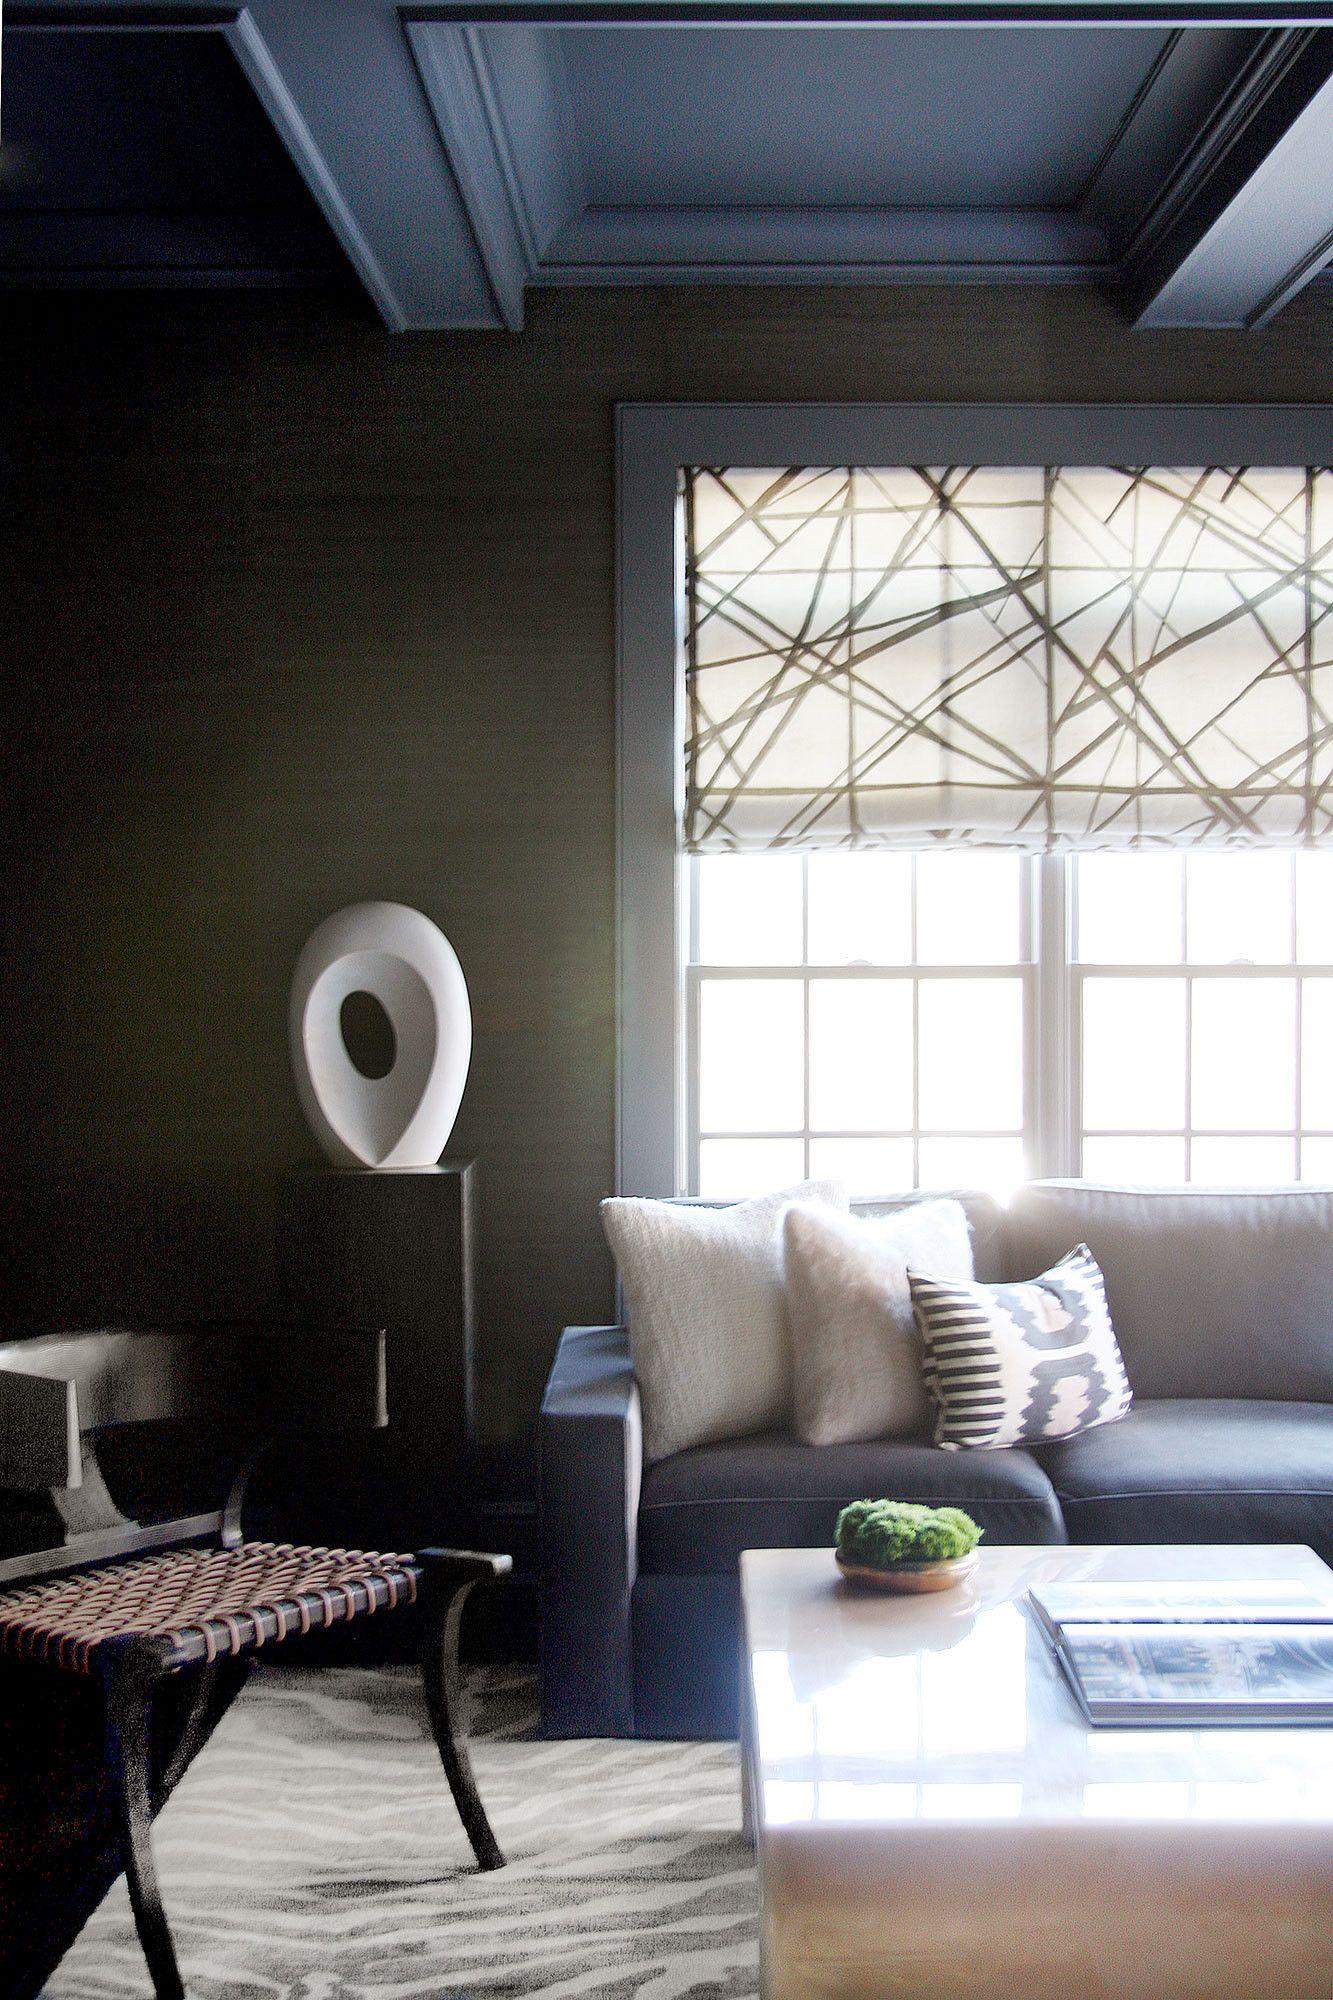 Designsforlivingroom my house in pinterest family room design and interior also rh